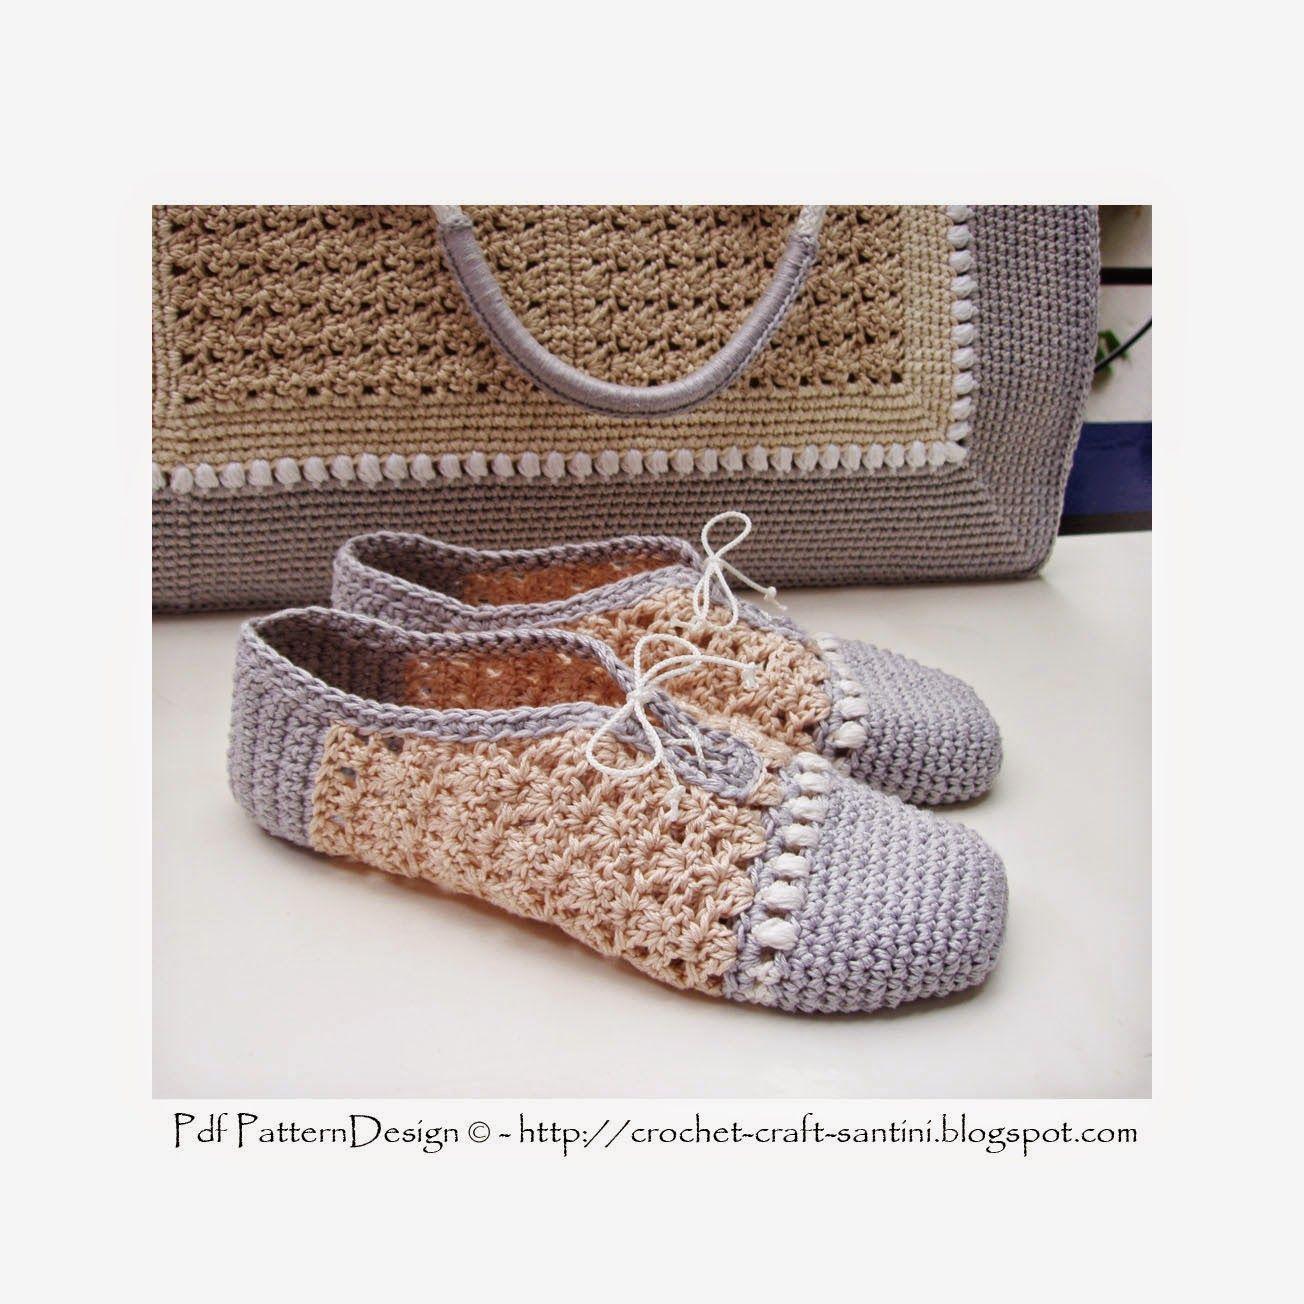 Crochet & Craft: CROCHET SLIPPER/SHOES WITH MATCHING SHOPPING BAG ...